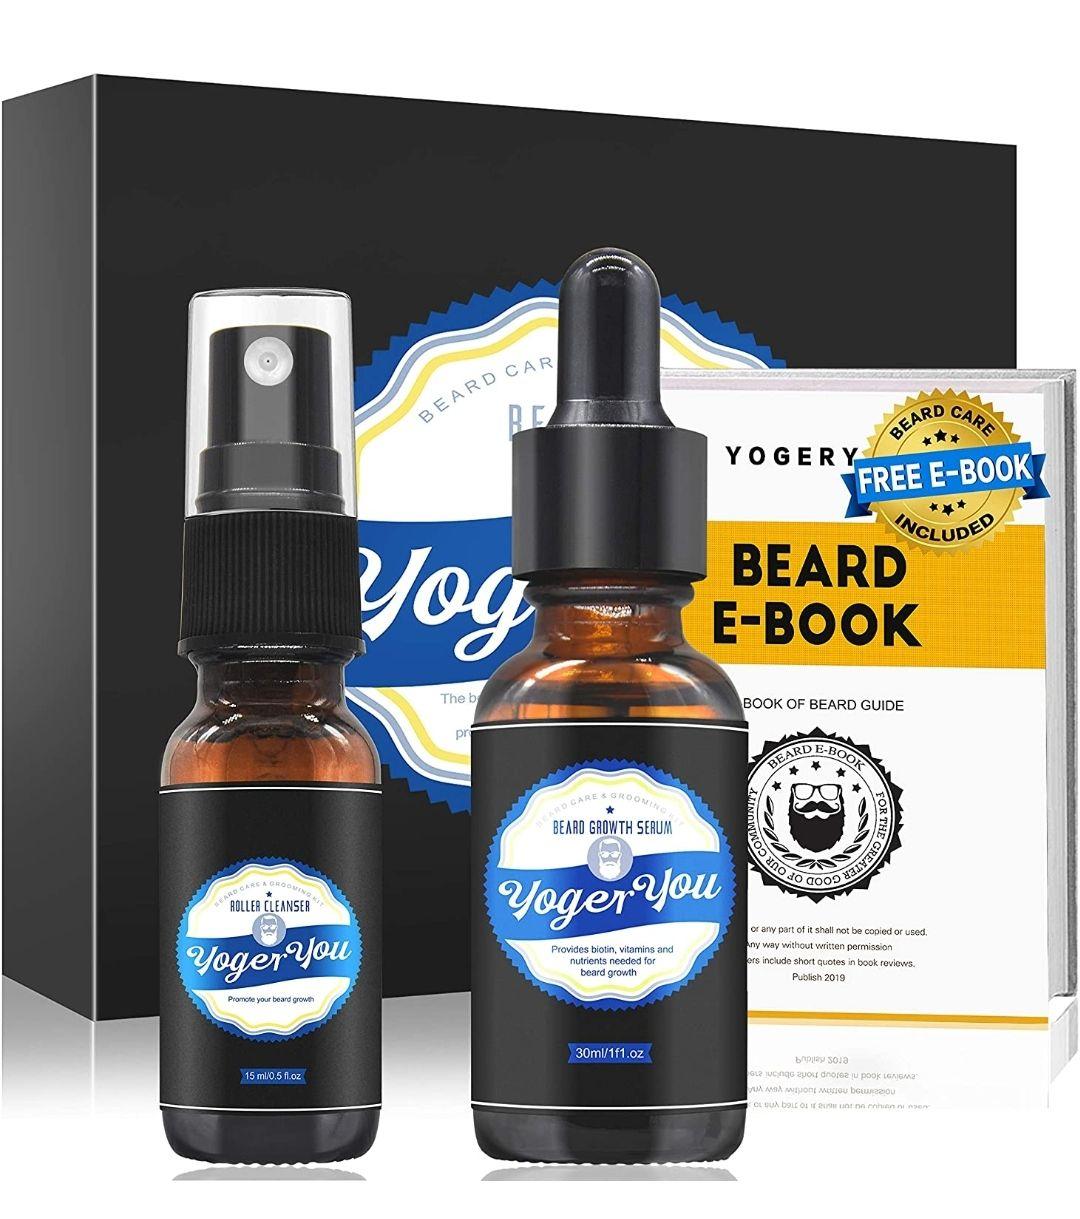 Beard Growth Kit, w/Beard Oil, Beard Roller, Roller Cleaner, E-Book, Beard Grooming Kit - £2.72 (+£4.49 Non Prime) @ Sold By YEWE FBA